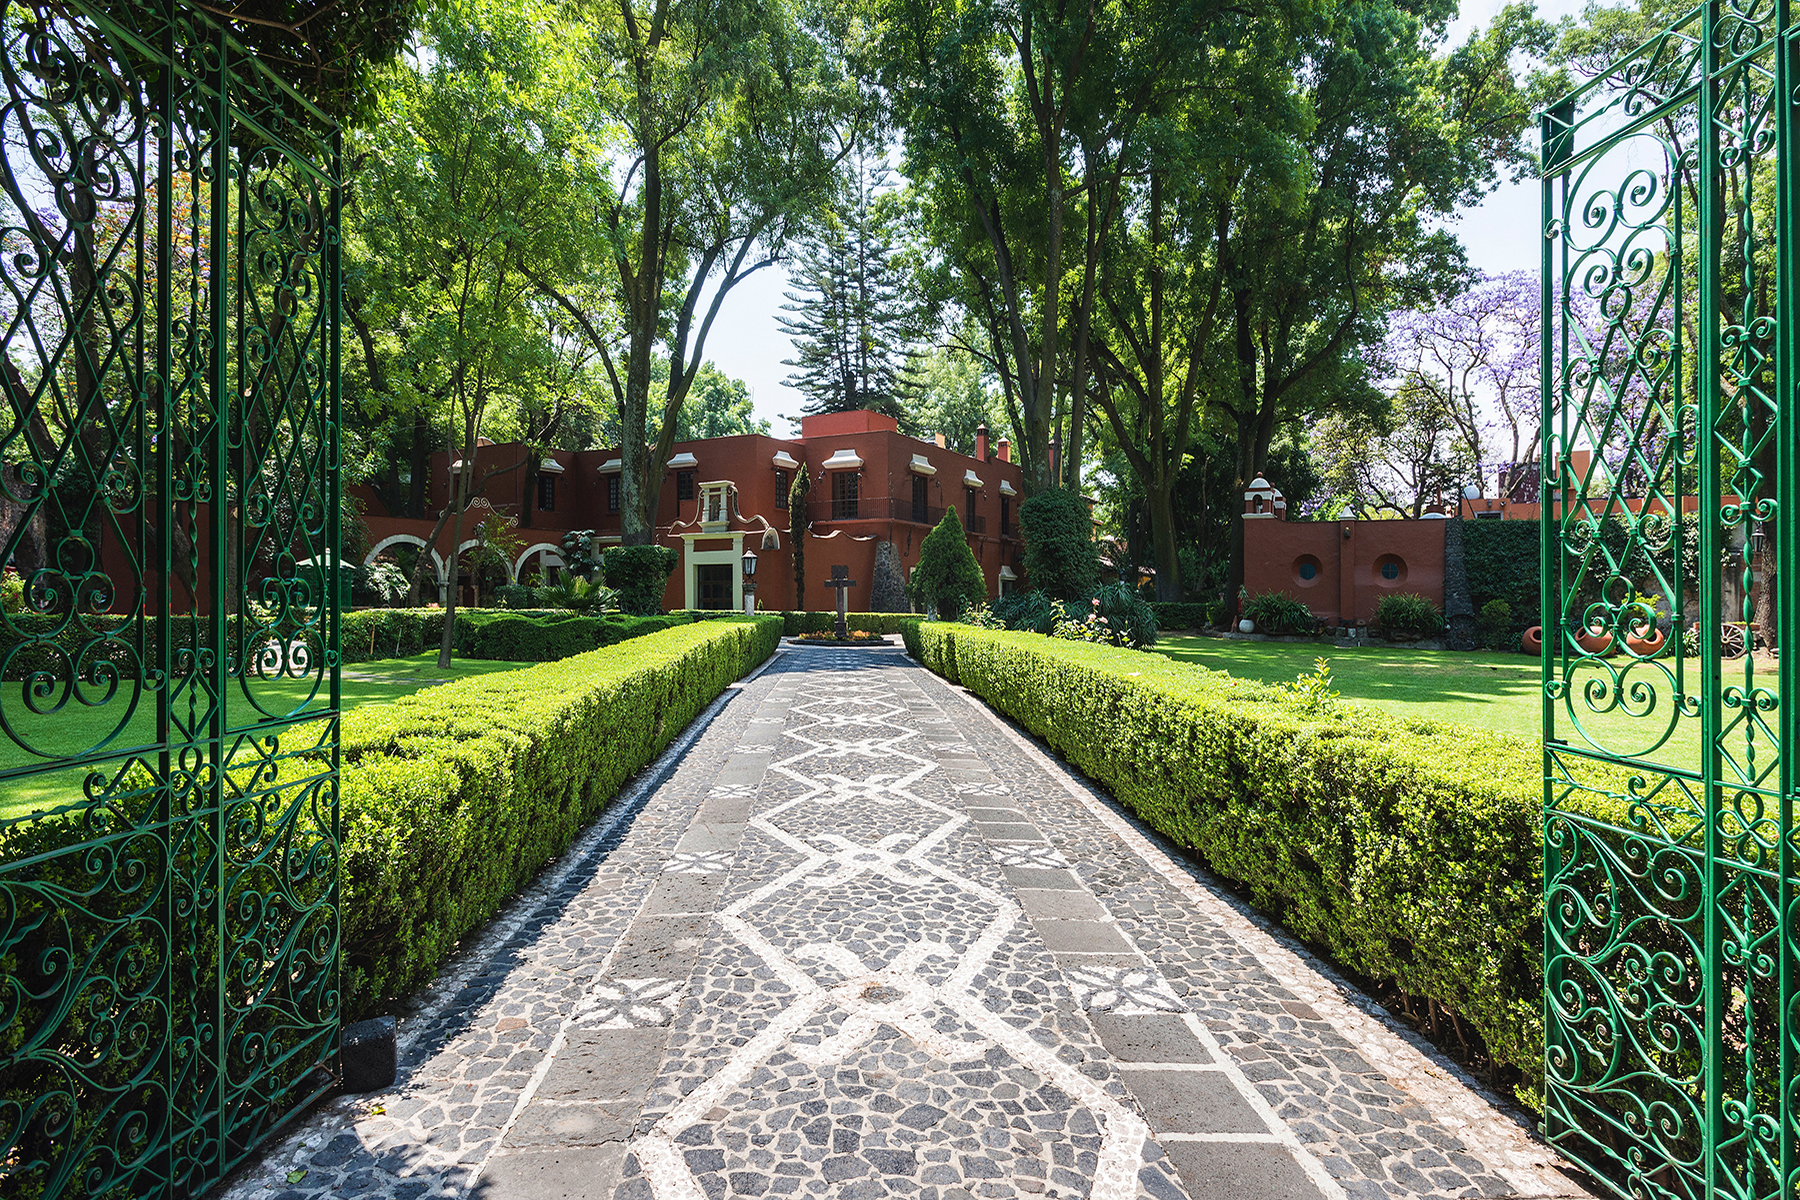 Ex-Hacienda de San Pedro Martir, Coyoacán